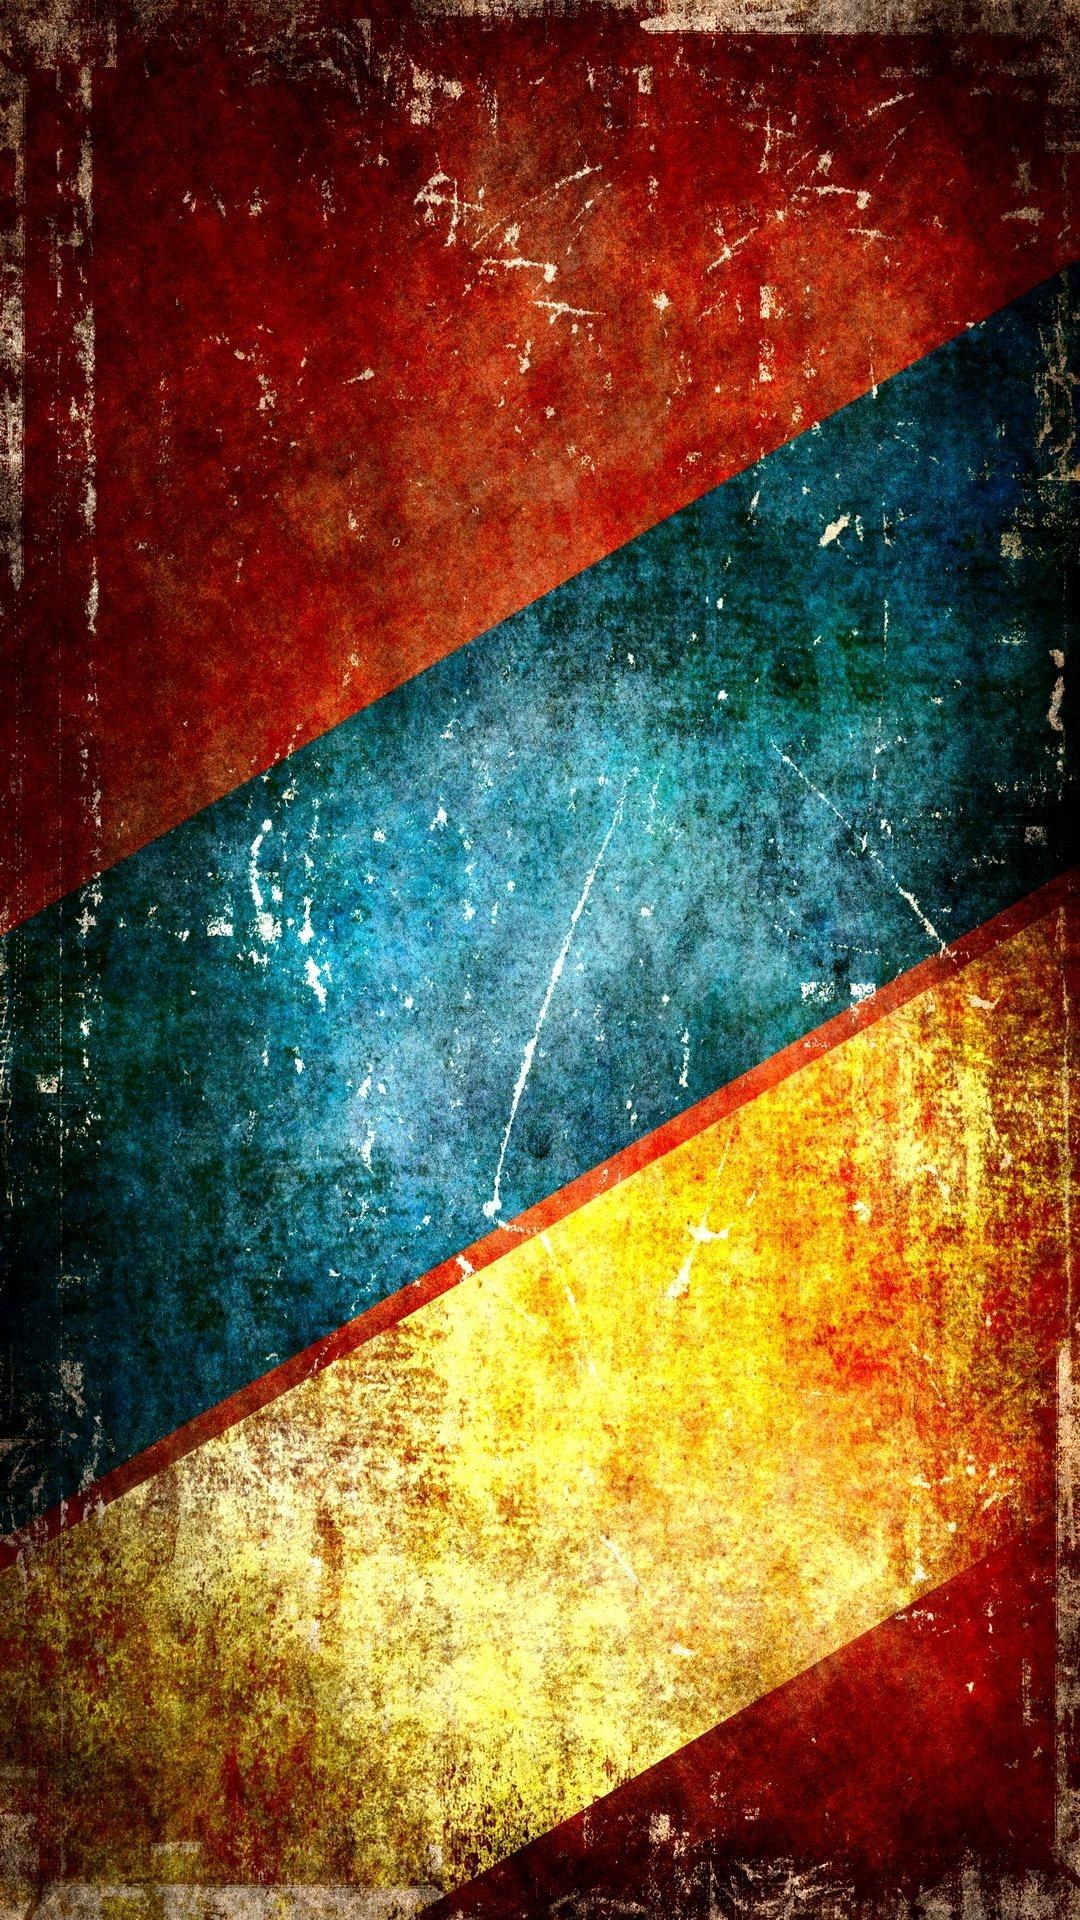 Grunge iPhone 7 wallpaper